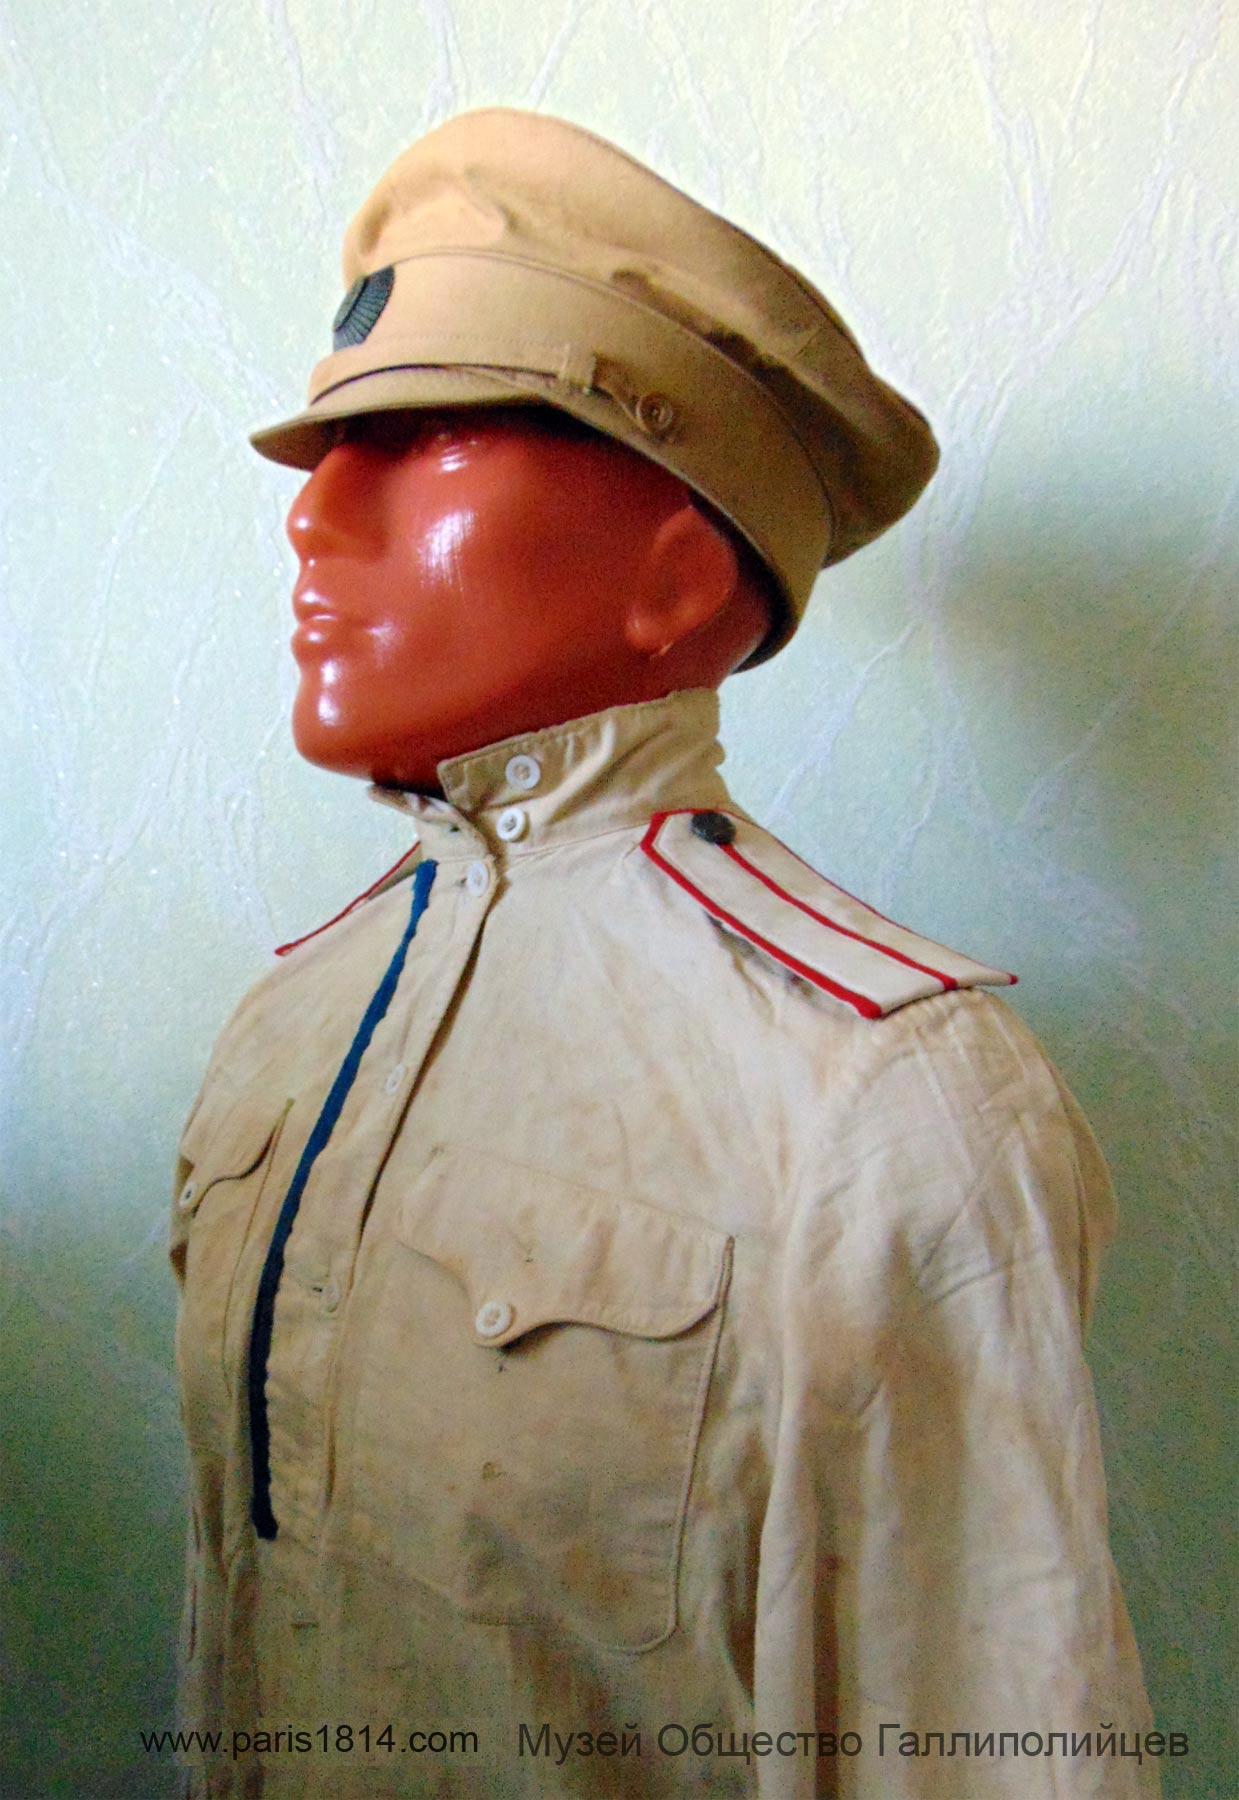 Галлиполи Музей униформа